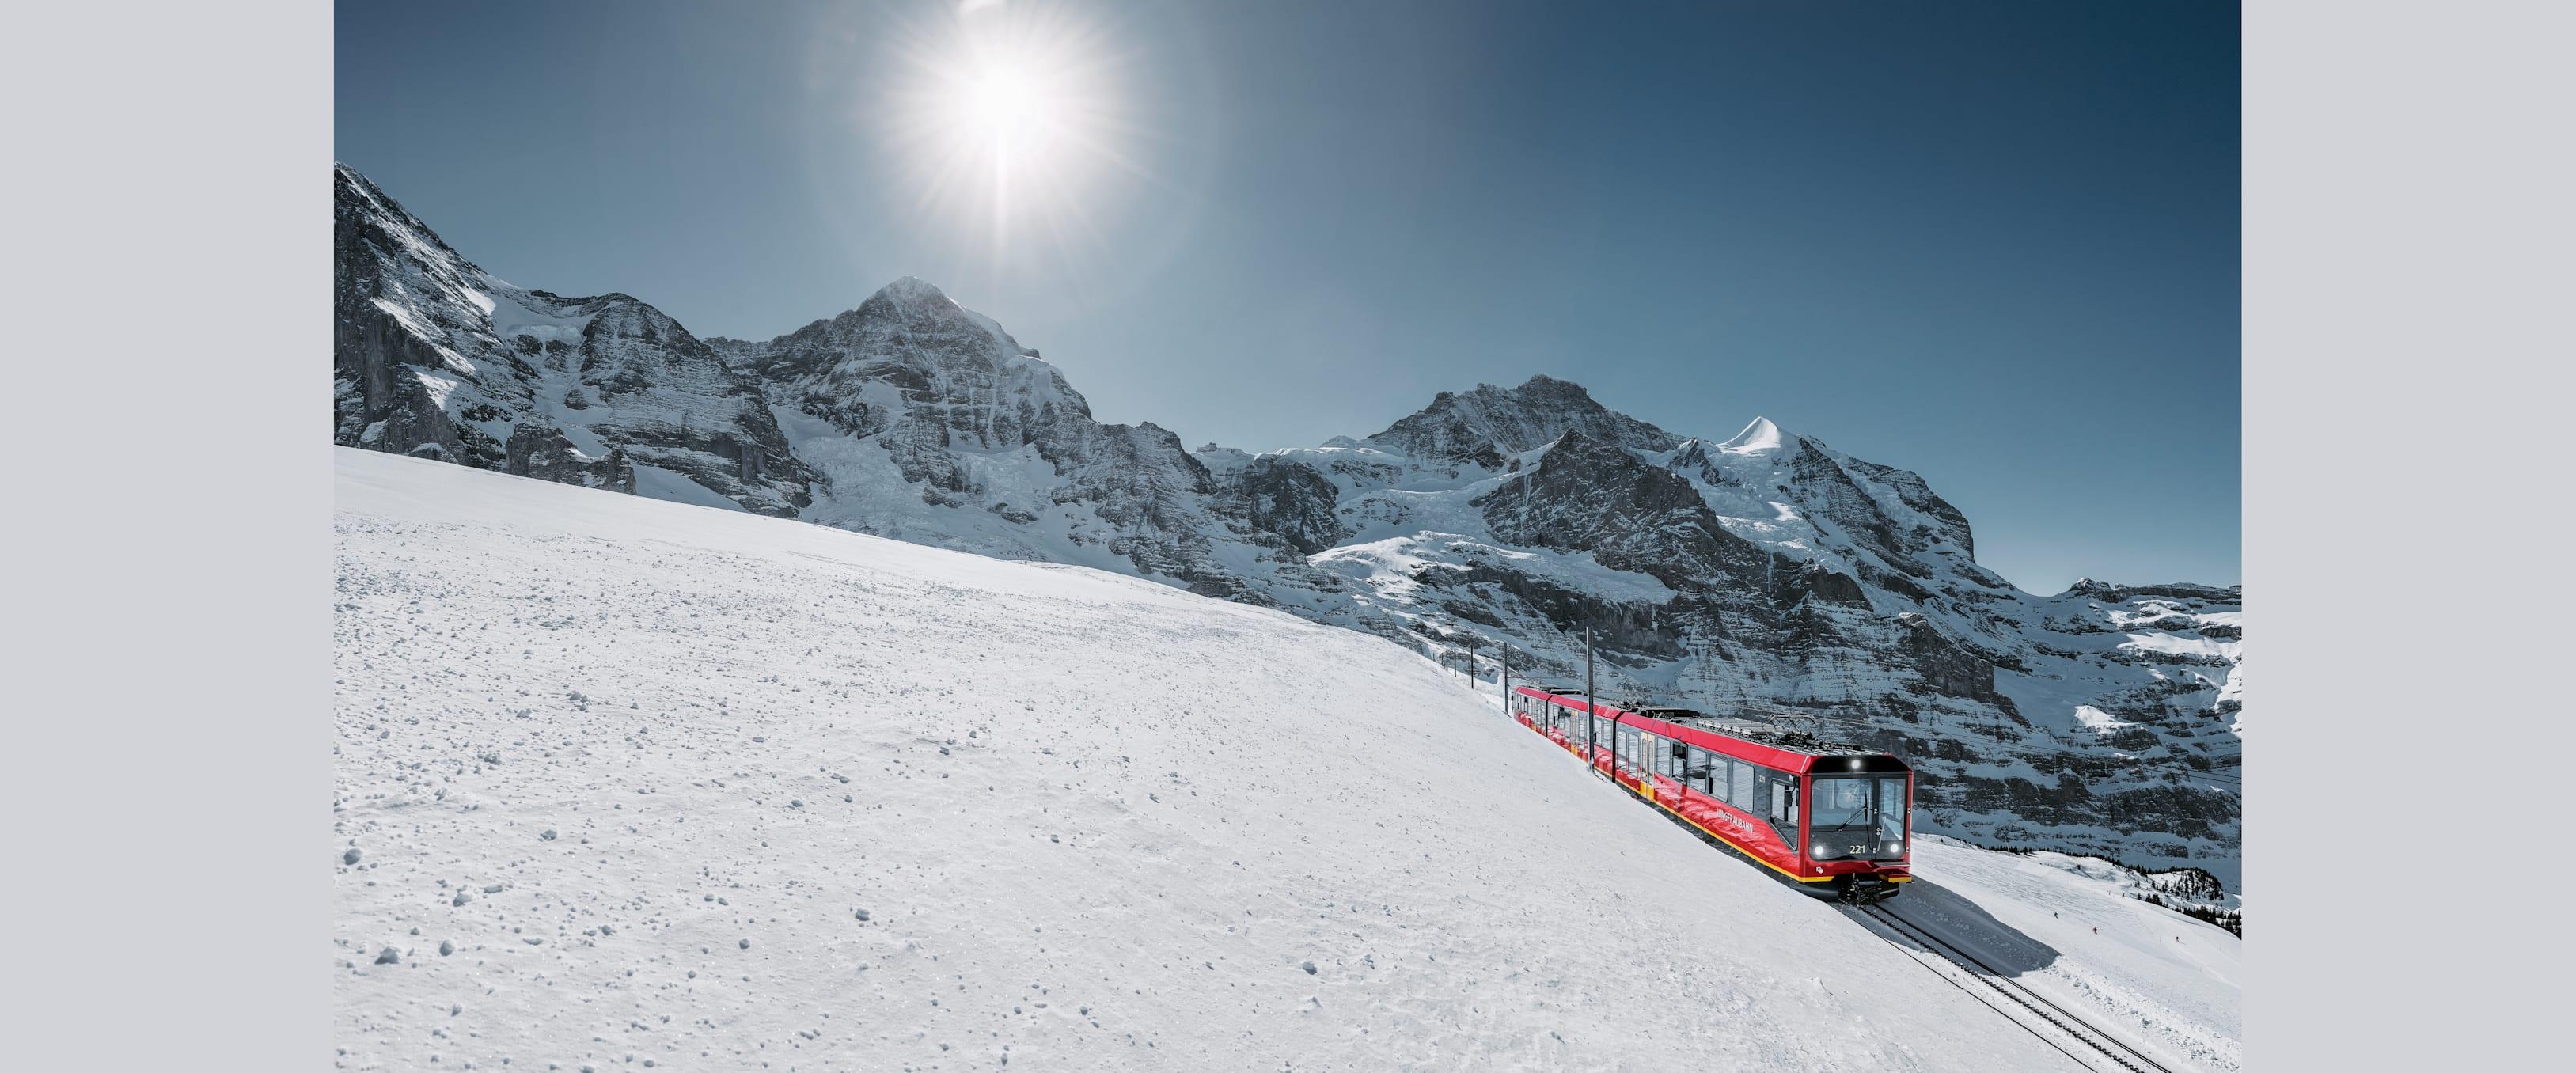 Jungfraubahn Winter